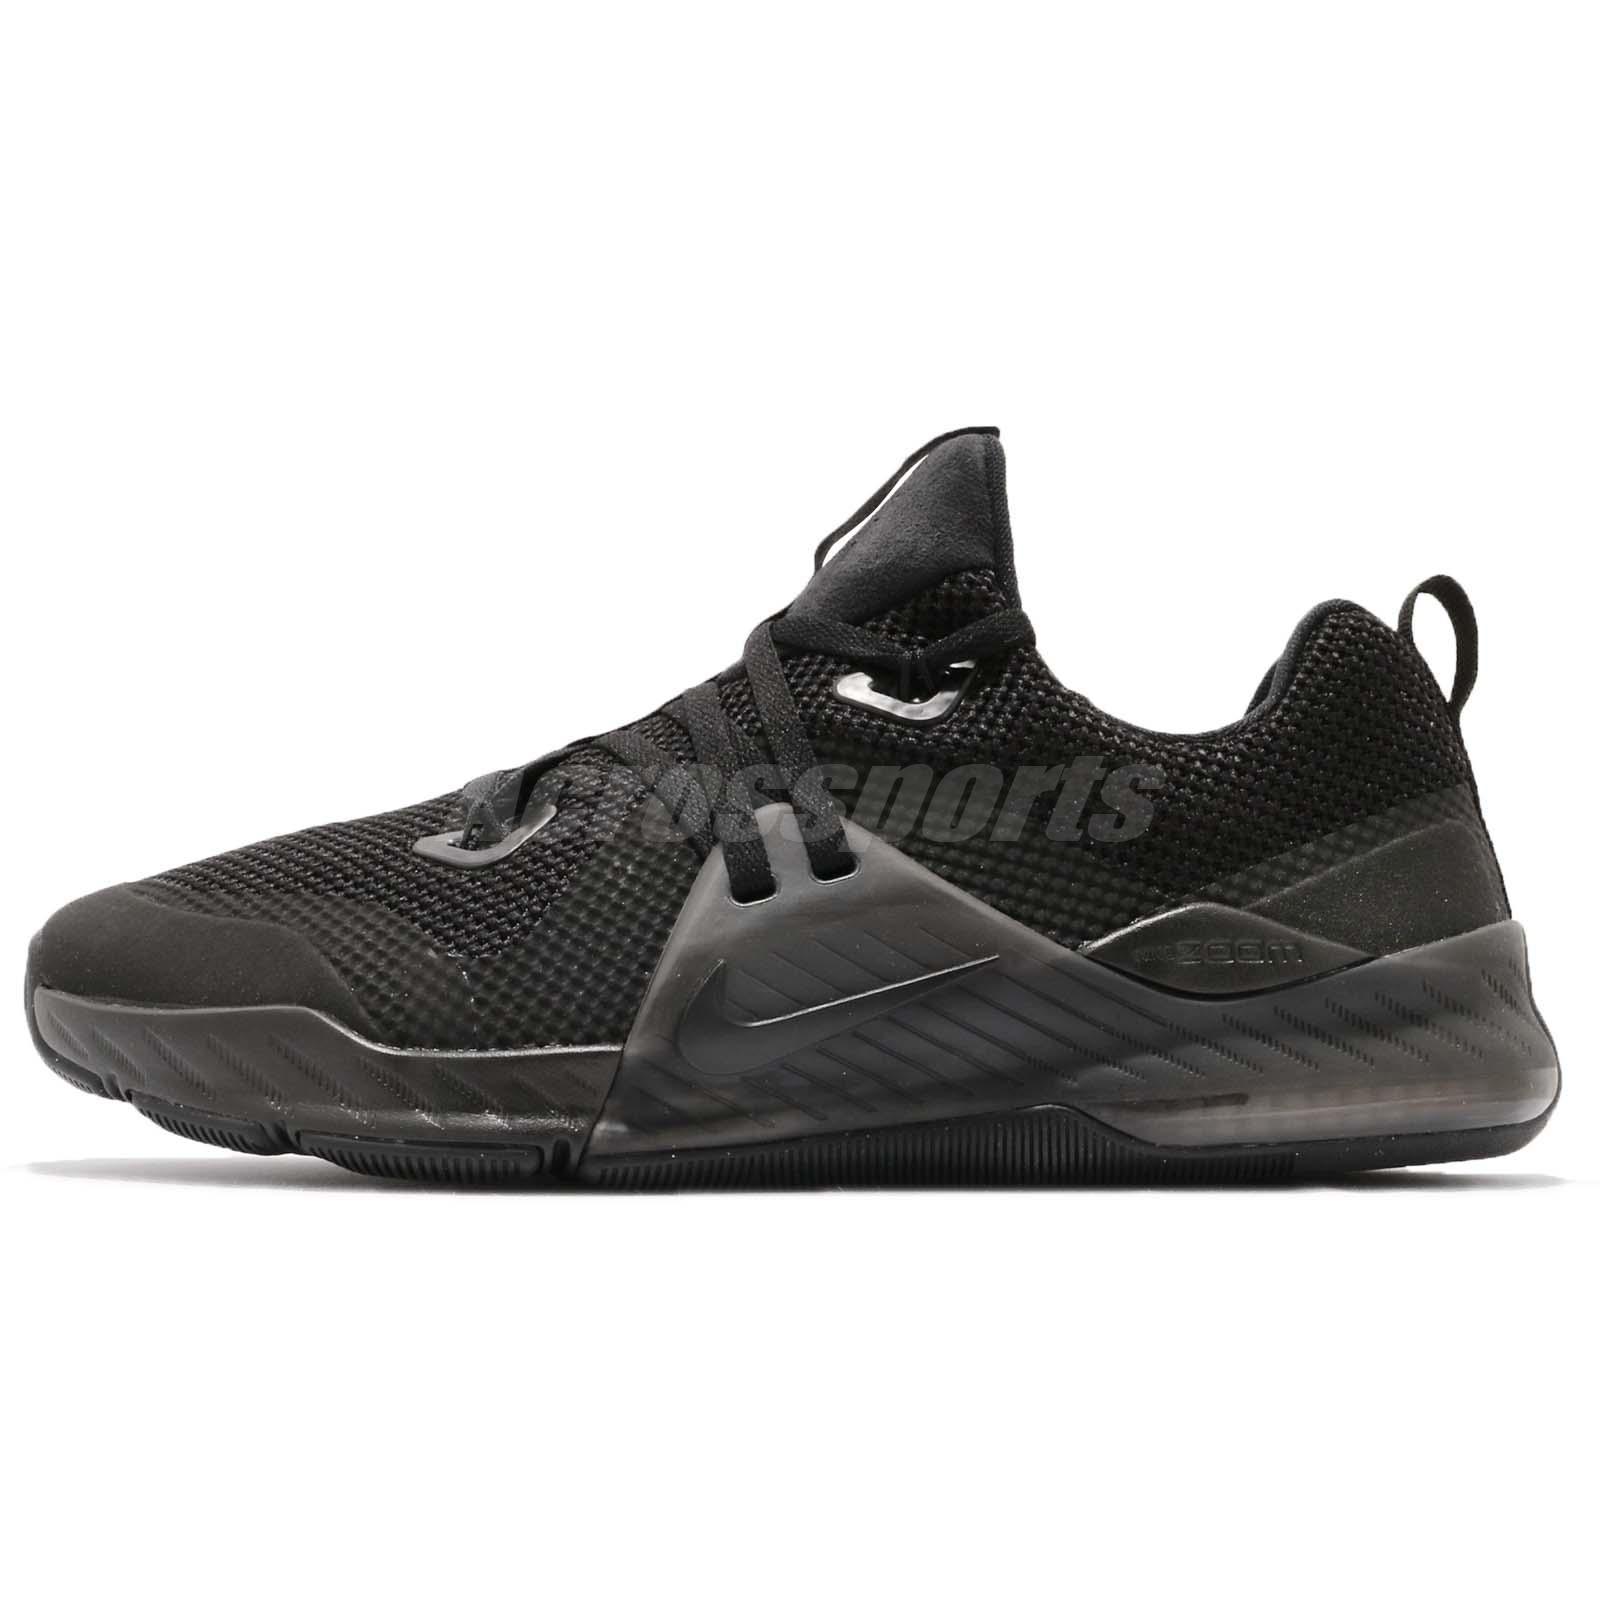 pretty nice d97f9 11e0c Nike Zoom Train Command Triple Black Men Cross Training Shoes Sneaker  922478-004